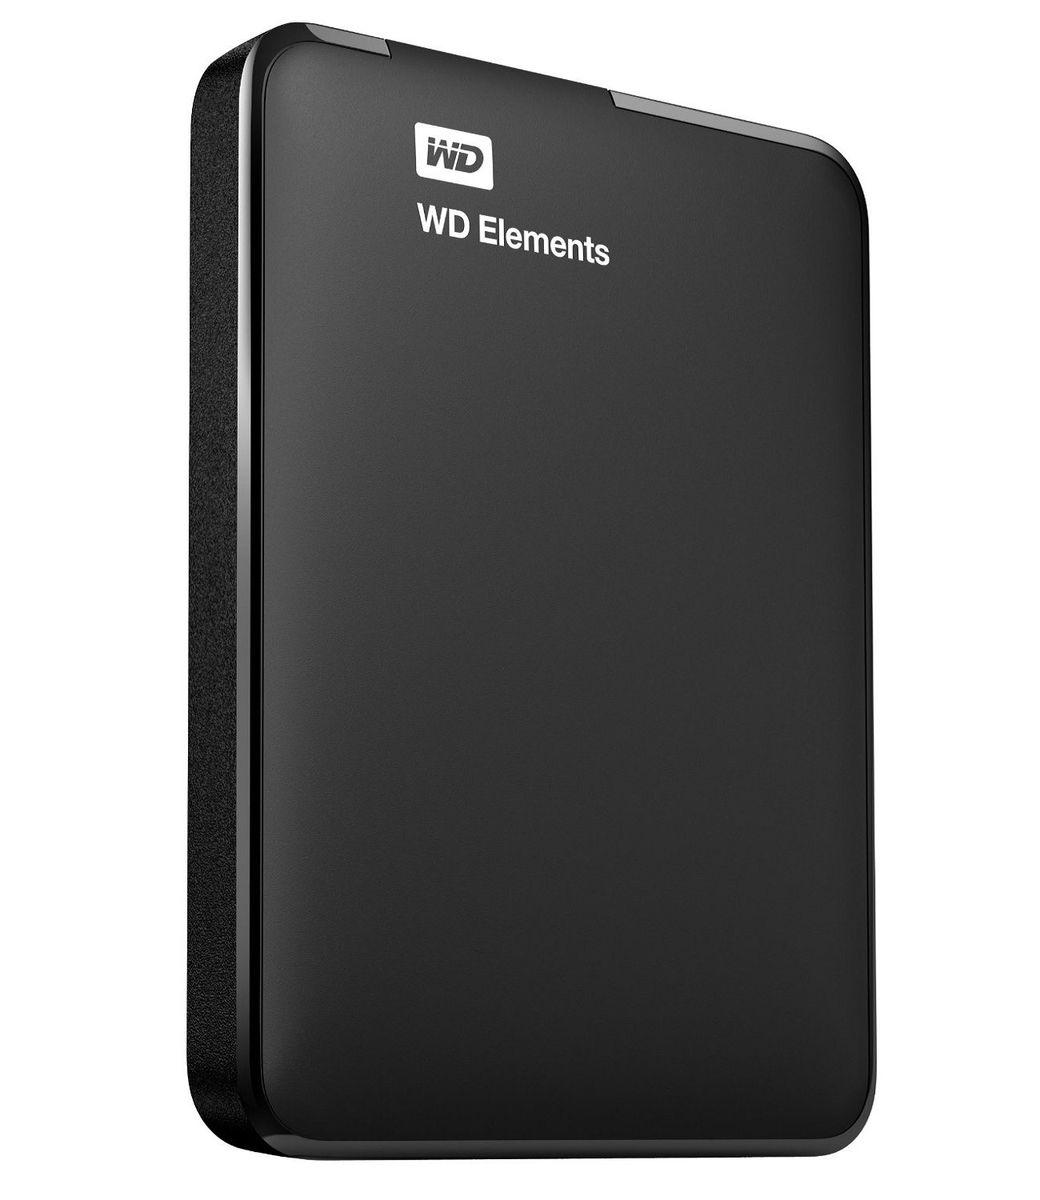 Portable Hard Drives Wd My Passport Transcend Seagate Hdd Hardisk Pc Internal 35 1tb 1000gb Elements 25 Inch Drive Black